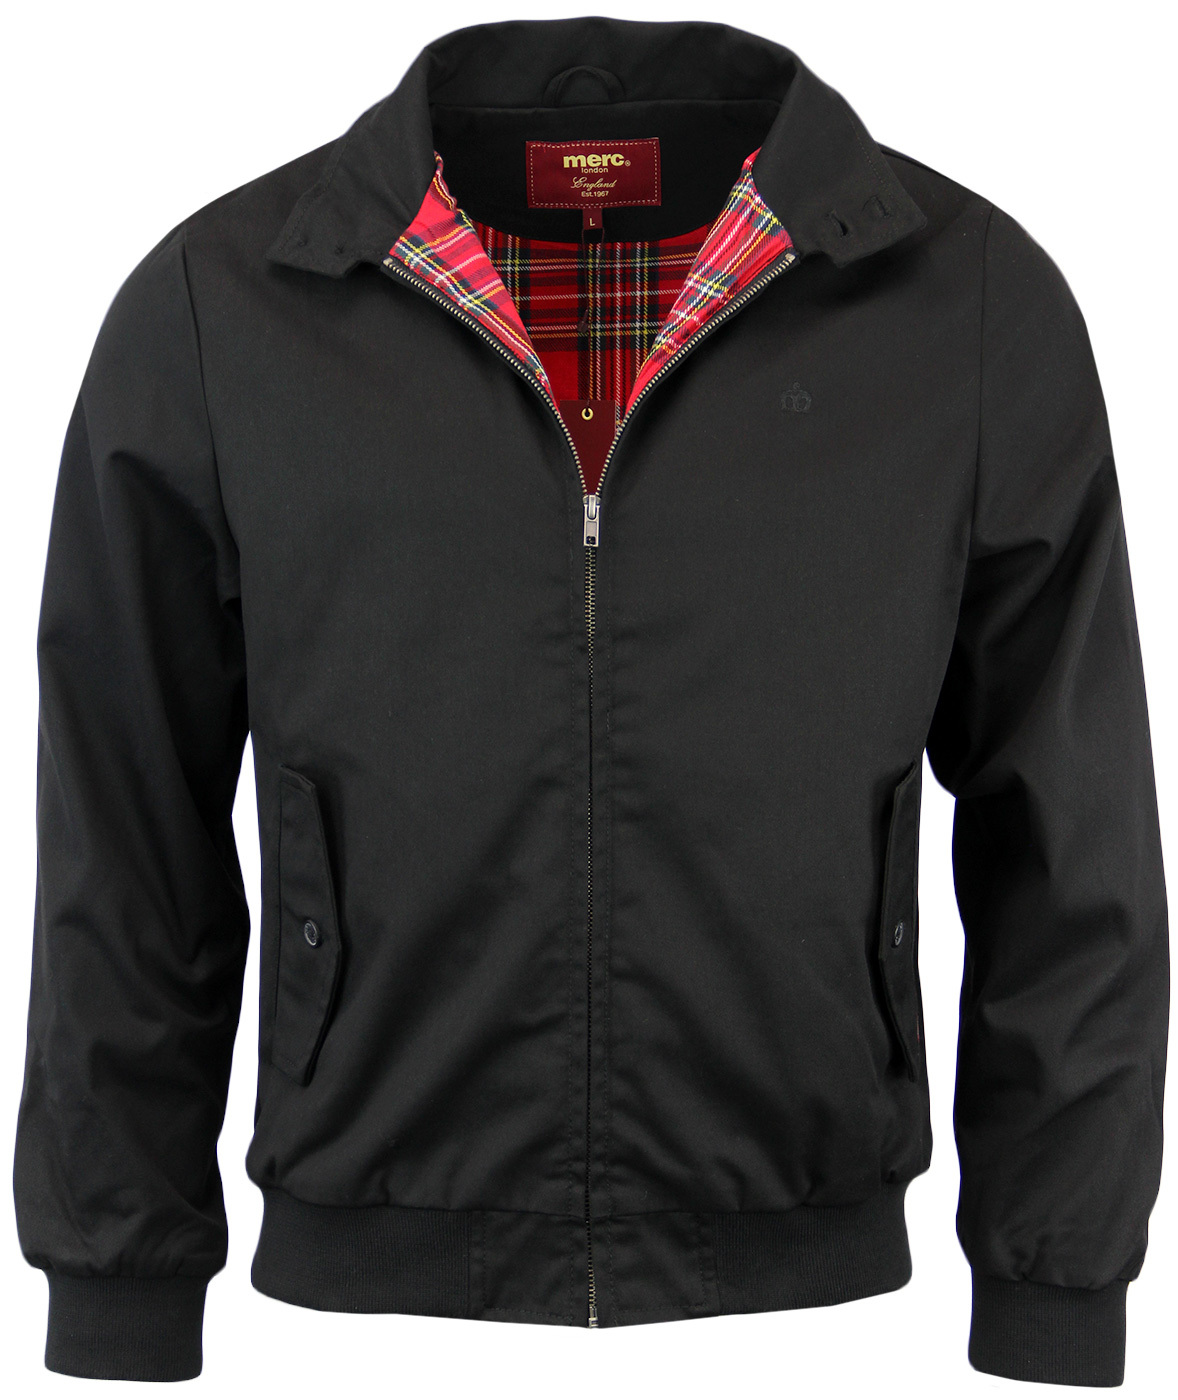 Harrington MERC Retro Indie Classic Mod Jacket B